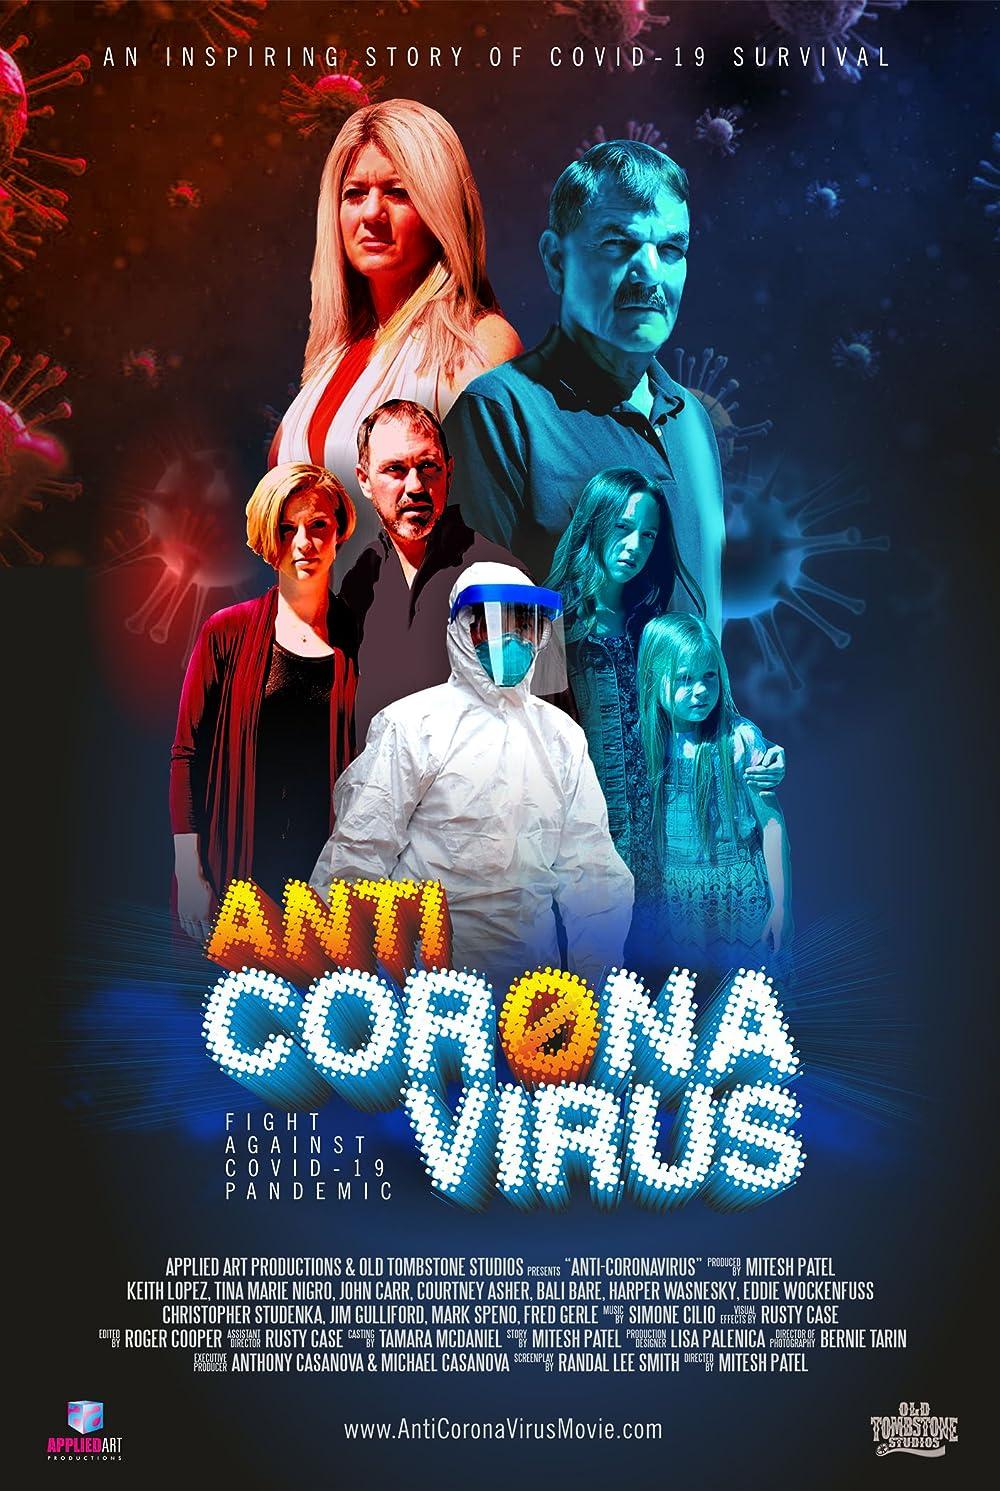 Download Anti Corona Virus (2020) Hindi (Voice Over) Dubbed+ English [Dual Audio] WebRip 720p [1XBET] Full Movie Online On 1xcinema.com & KatMovieHD.sk